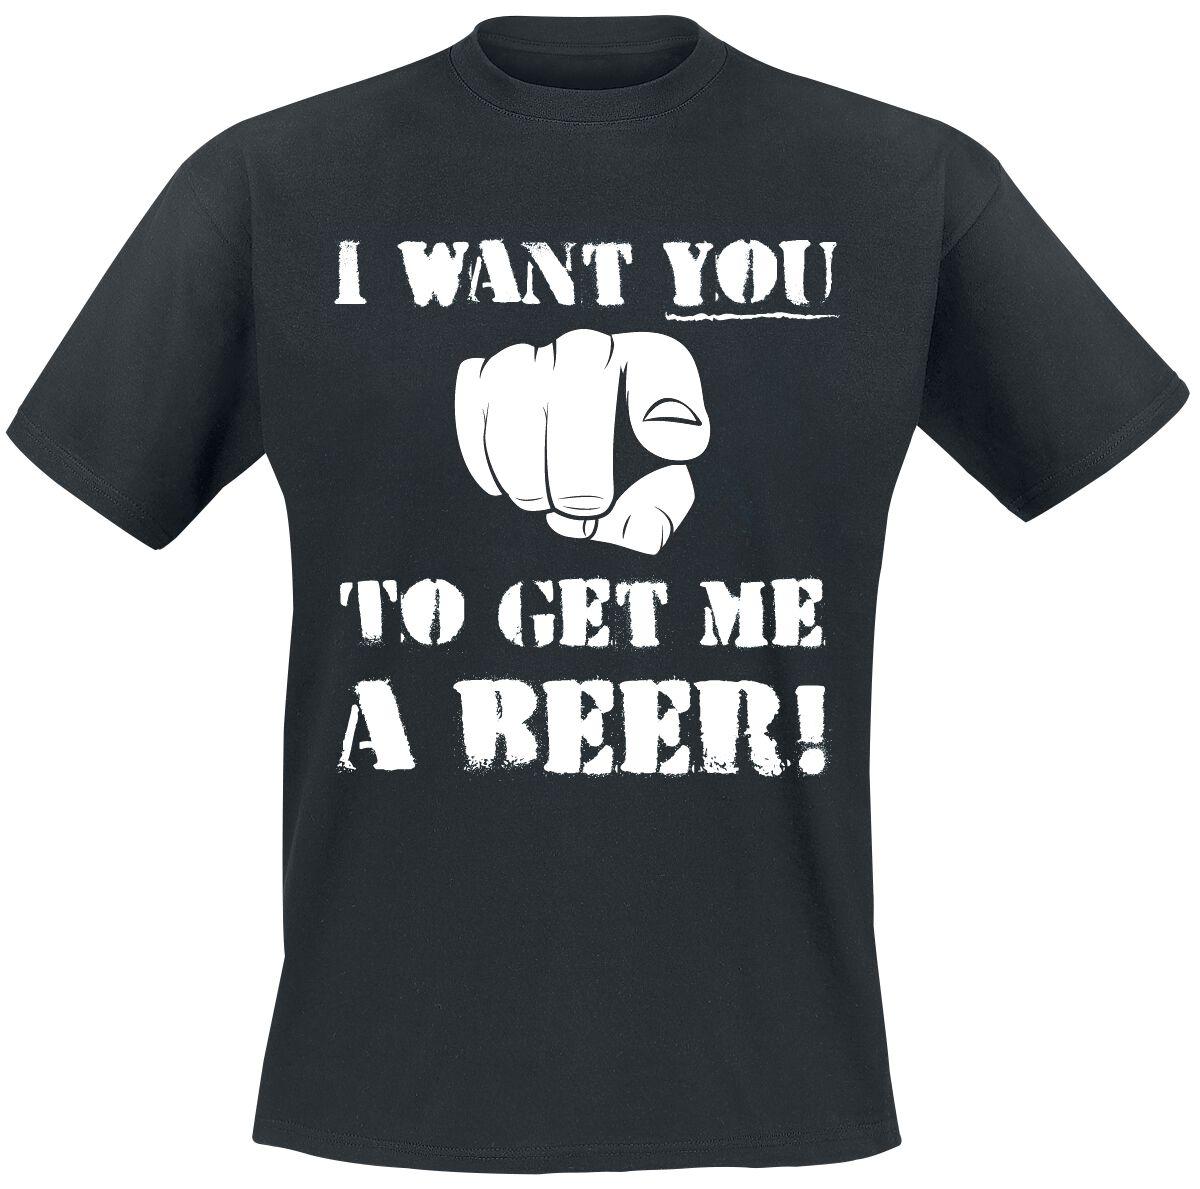 Fun Shirts - Koszulki - T-Shirt I Want You To Get Me A Beer! T-Shirt czarny - 368393